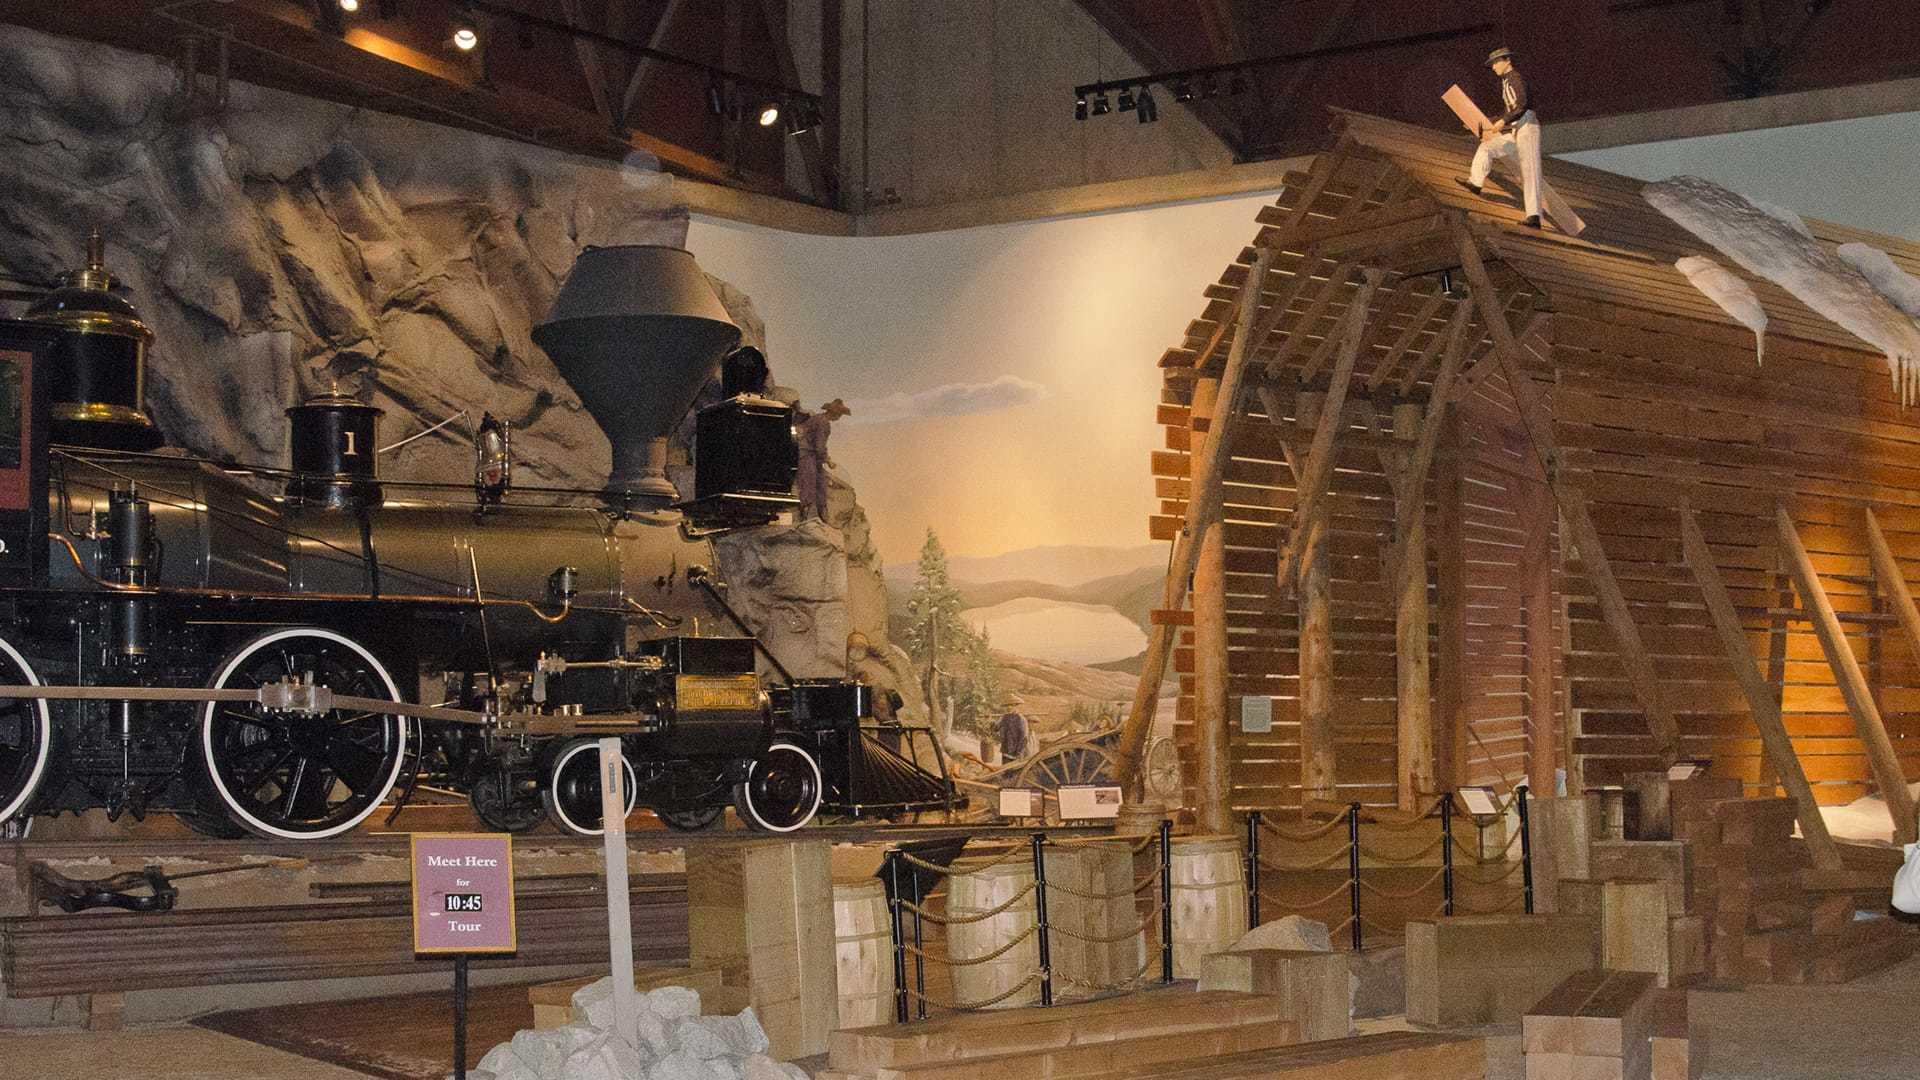 Photographs California State Railroad Museum